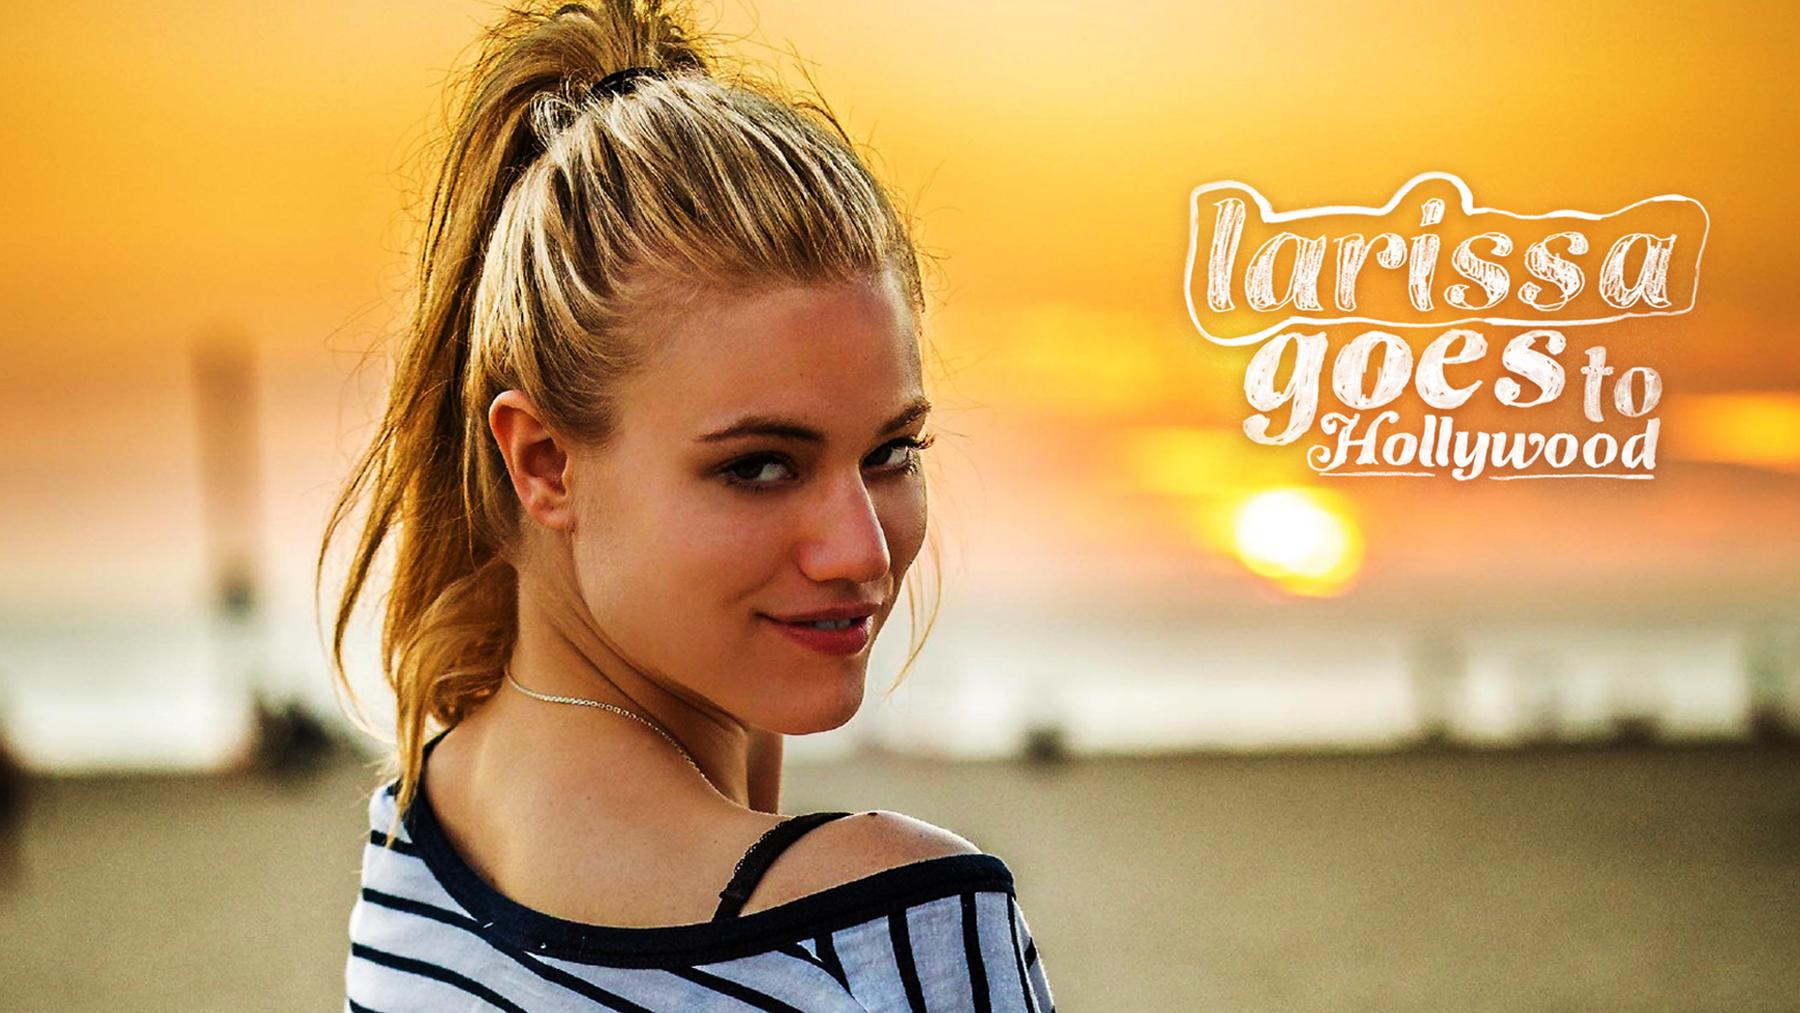 Larissa goes to Hollywood